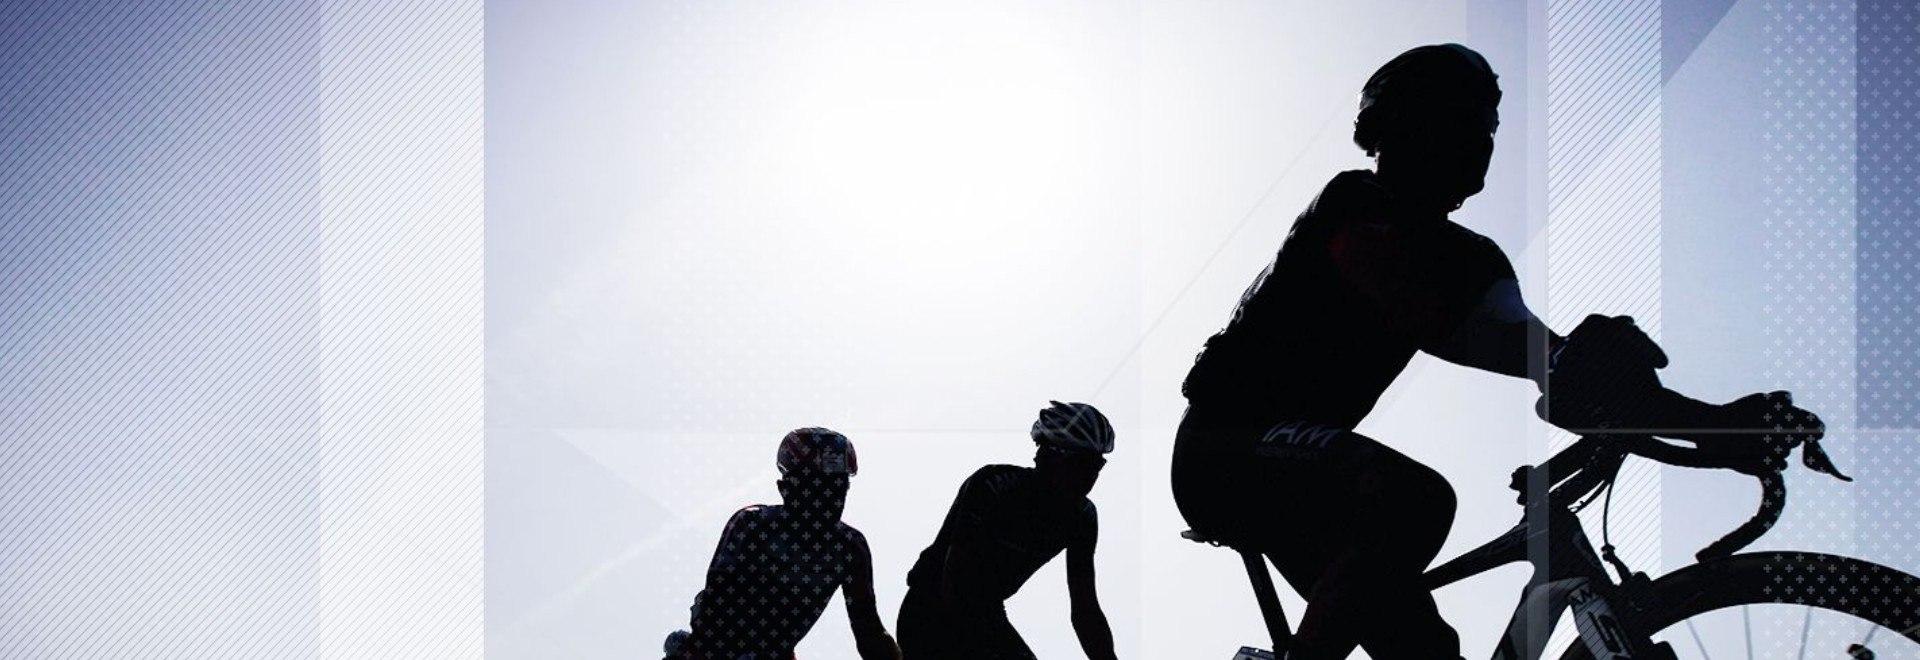 8a tappa Foggia - Guardia Sanframondi (173 km)